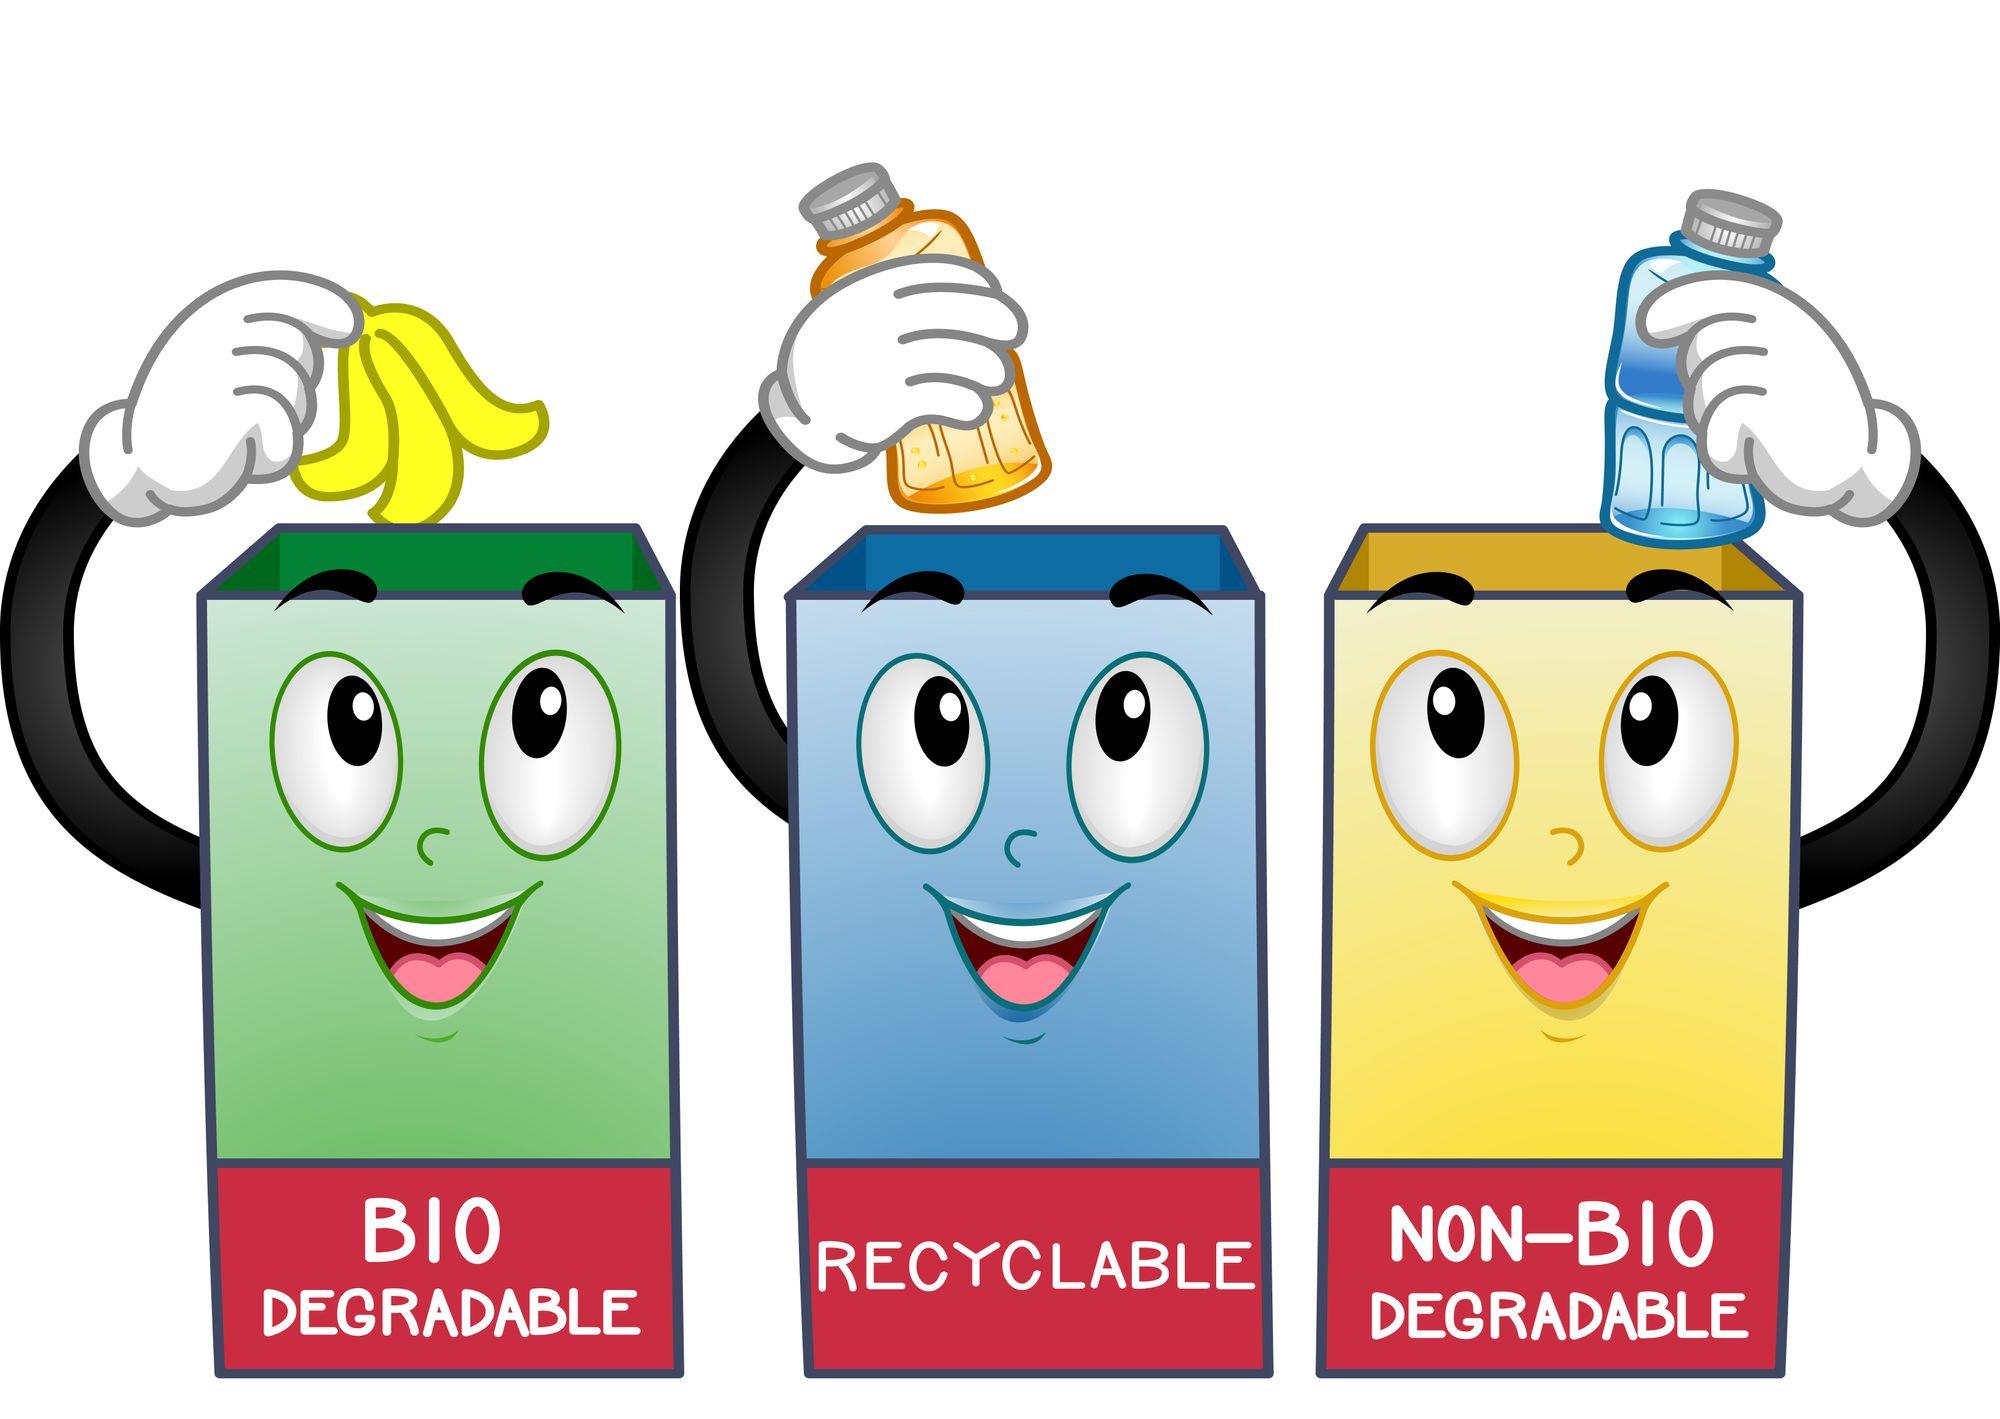 नॉन बायोडीग्रेडेबल (non-biodegradable) वेस्ट क्या है?